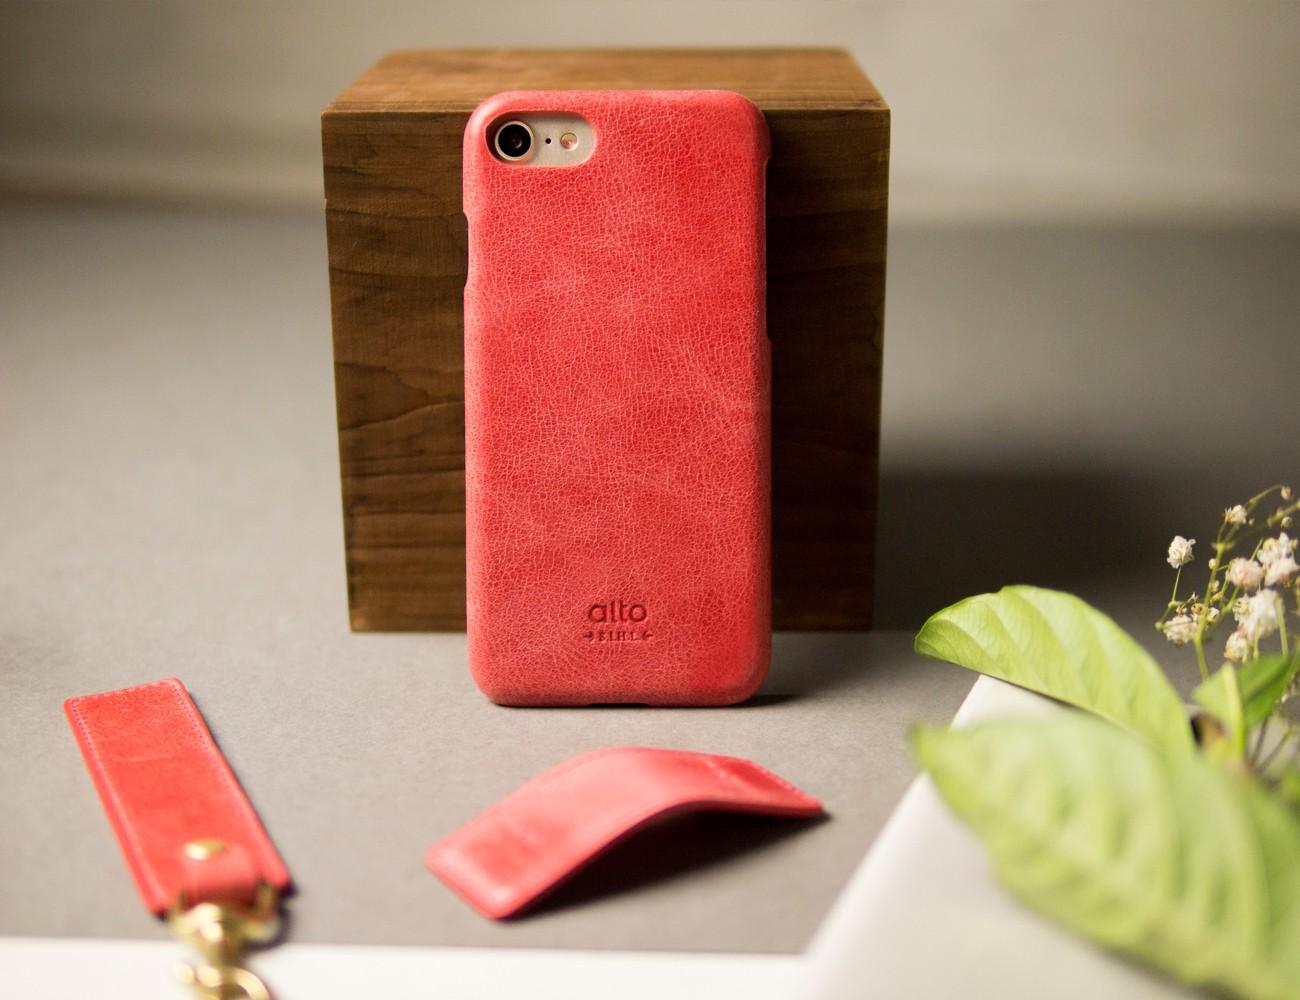 Alto Metro Leather iPhone Case